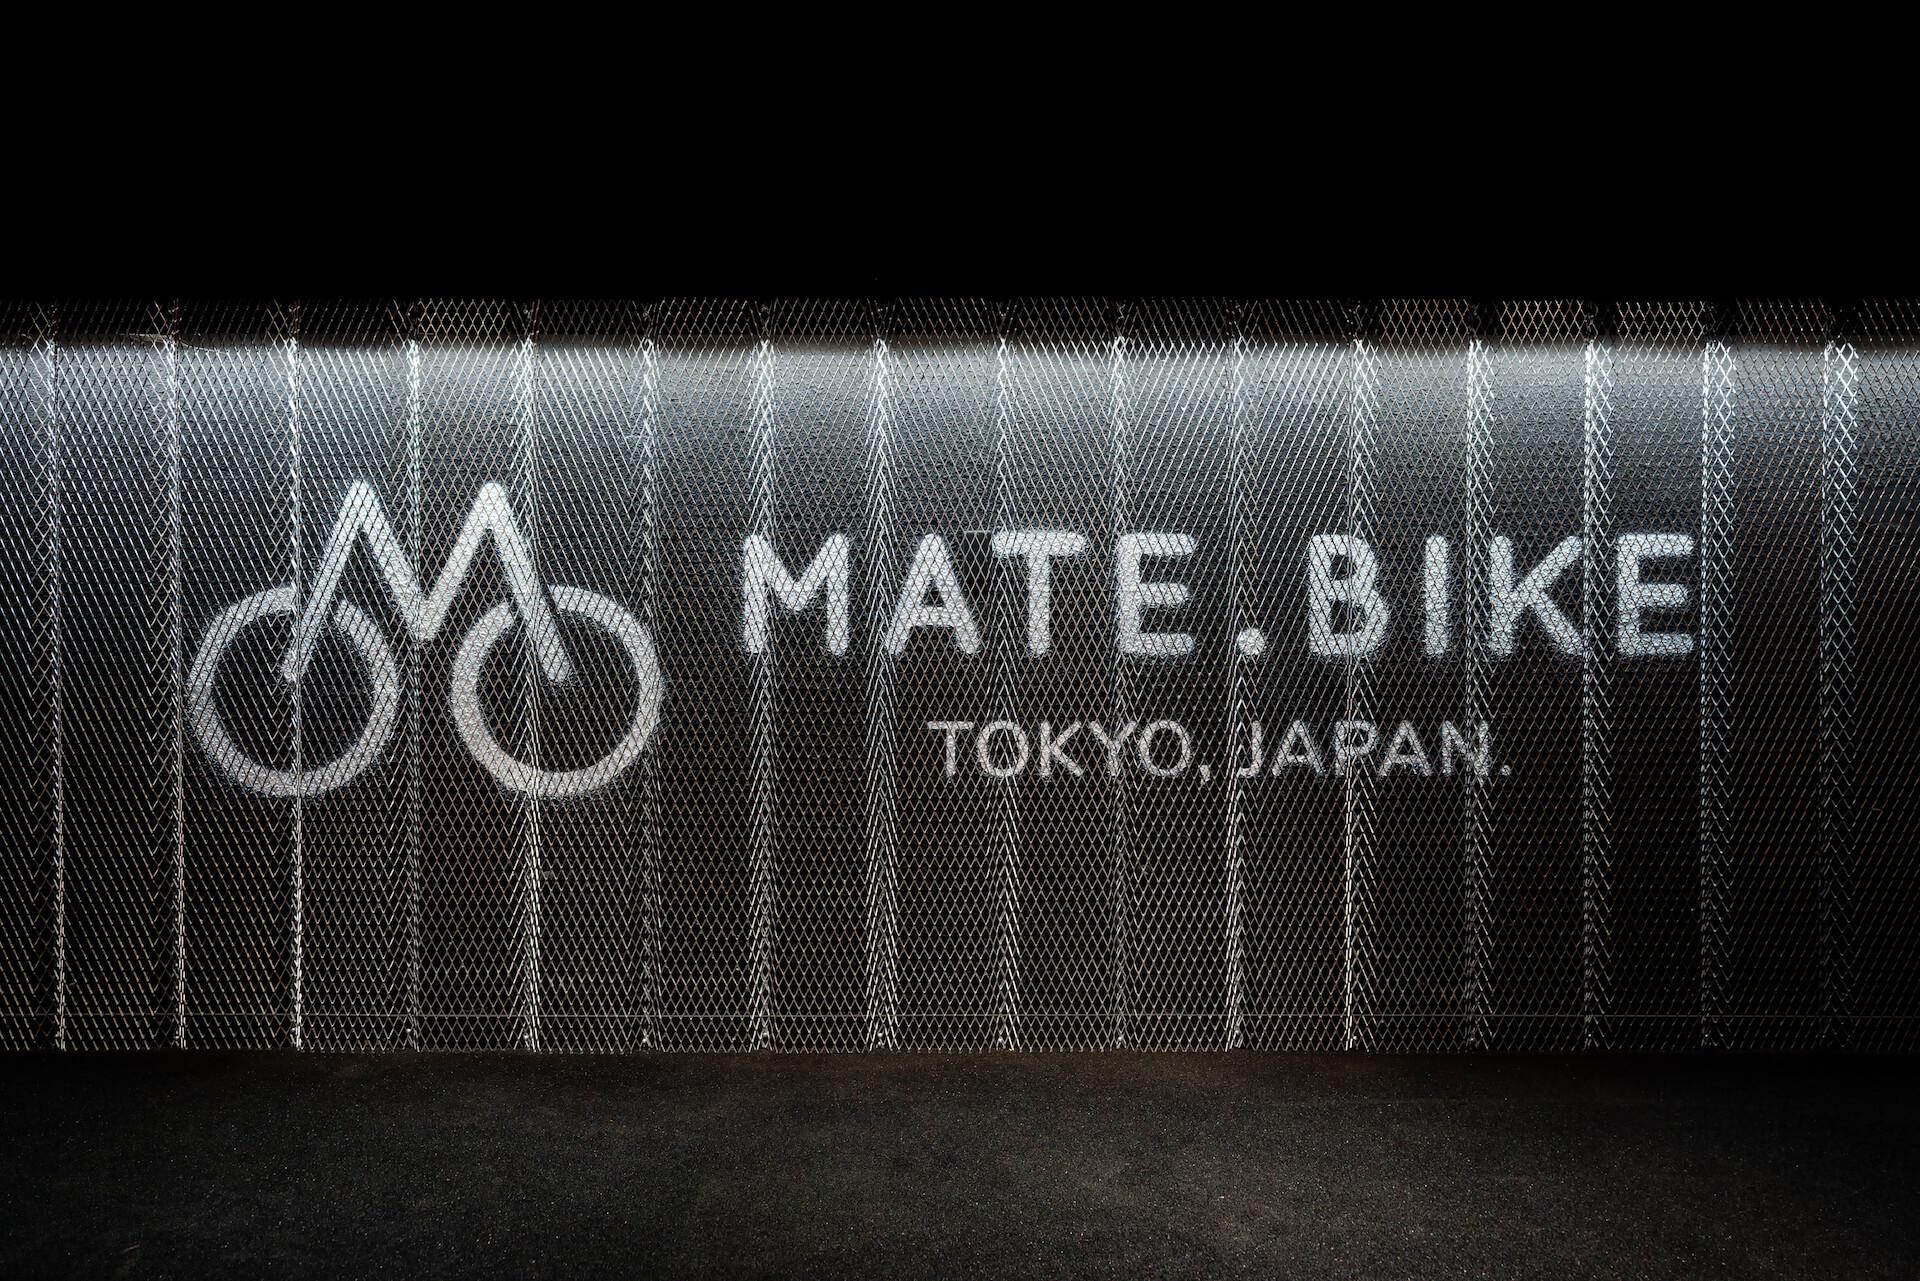 e-BIKE初のリペア&カスタムサービスを提供するラボ『MATE.BIKE SERVICE LABO Repair&Custom』が誕生! life210901_matebike_5